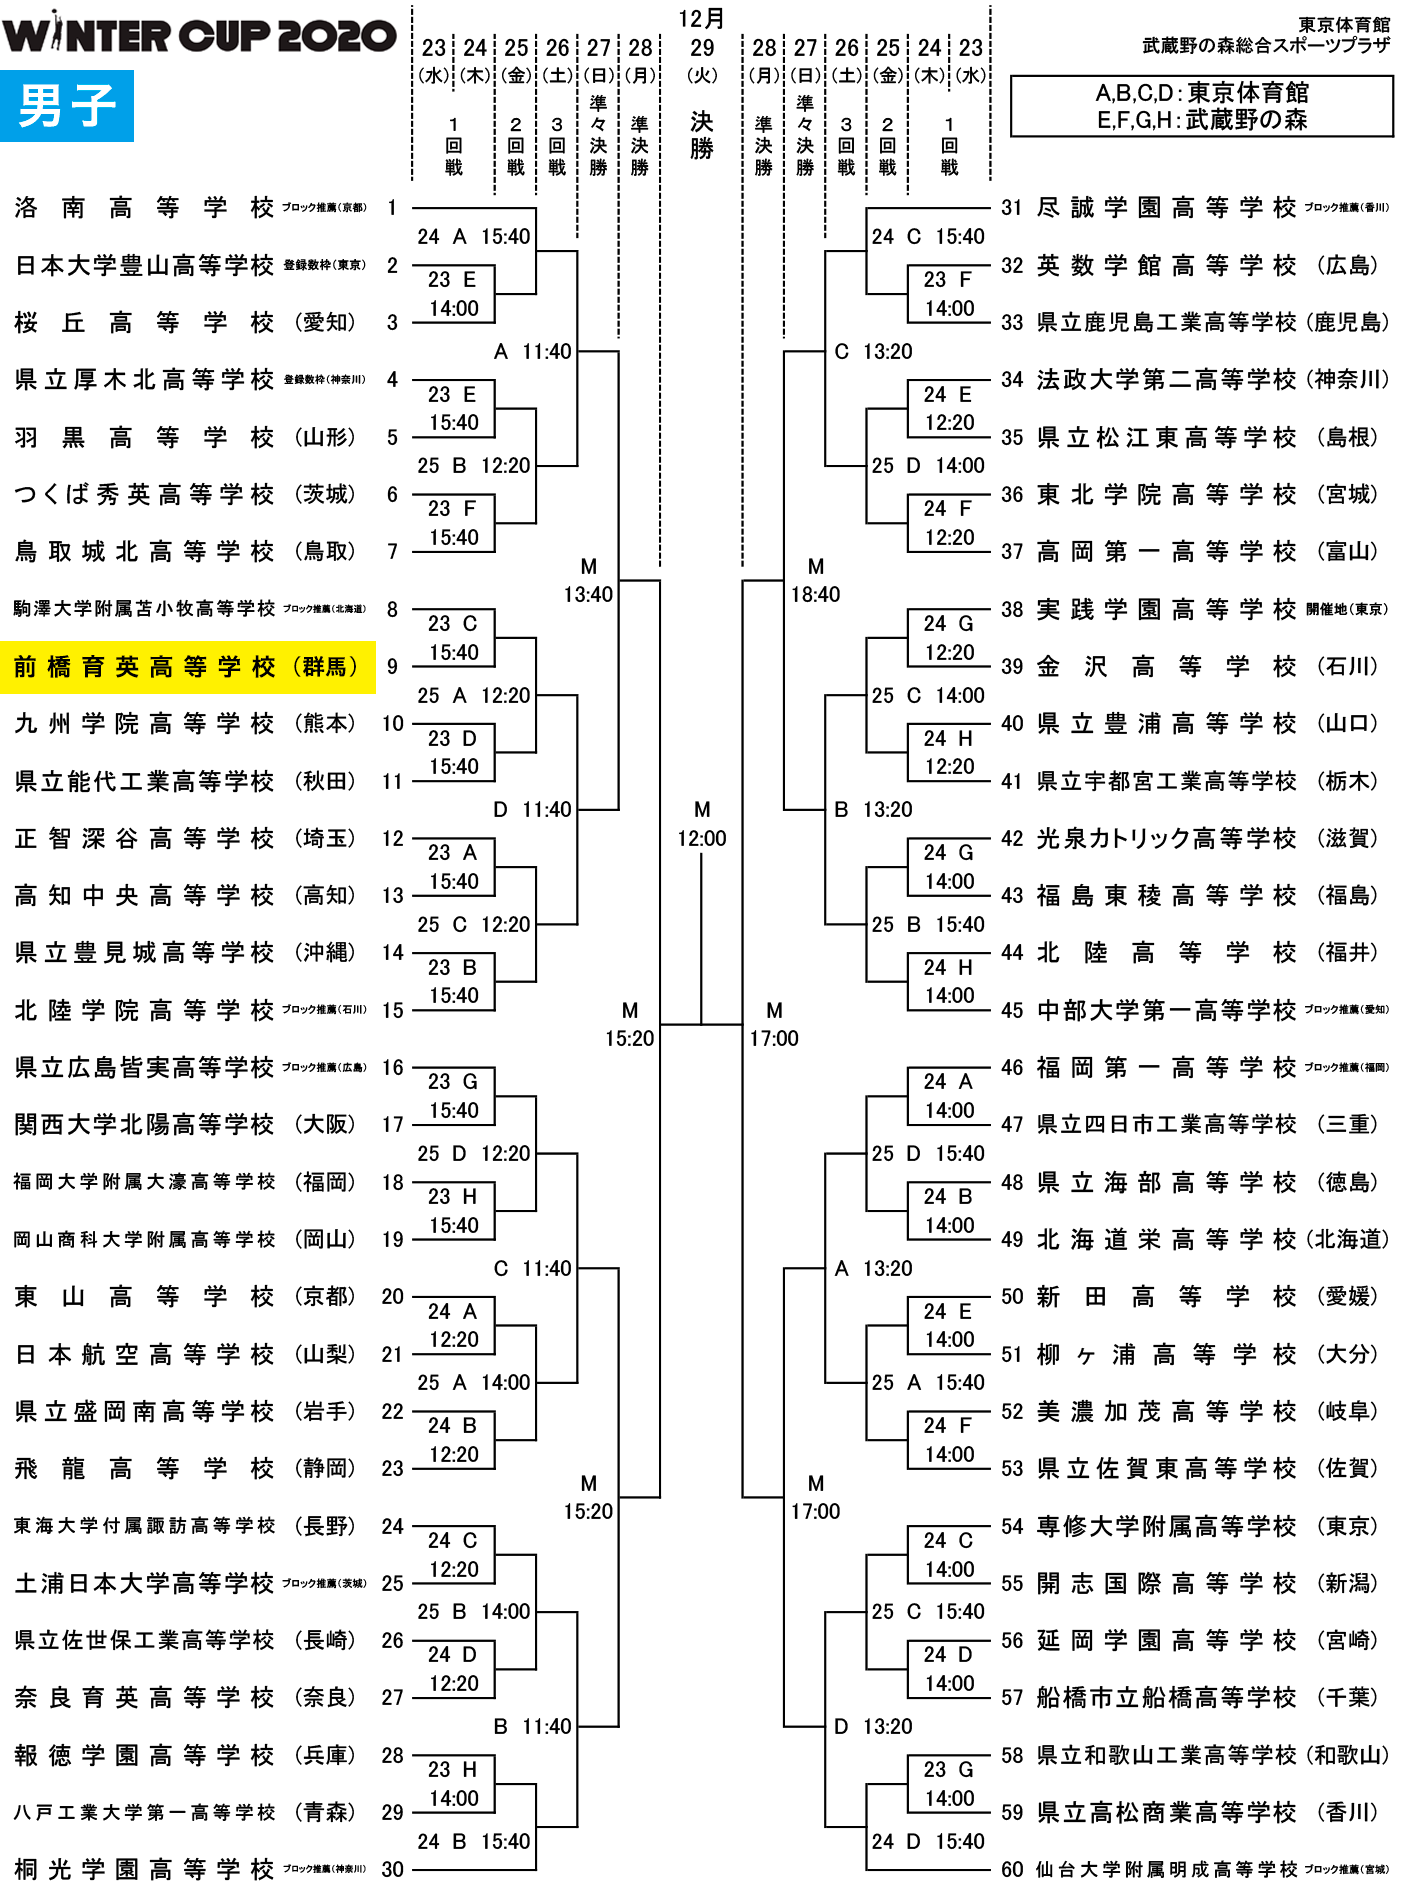 SoftBankウインターカップ2020 - 組み合わせ 男子